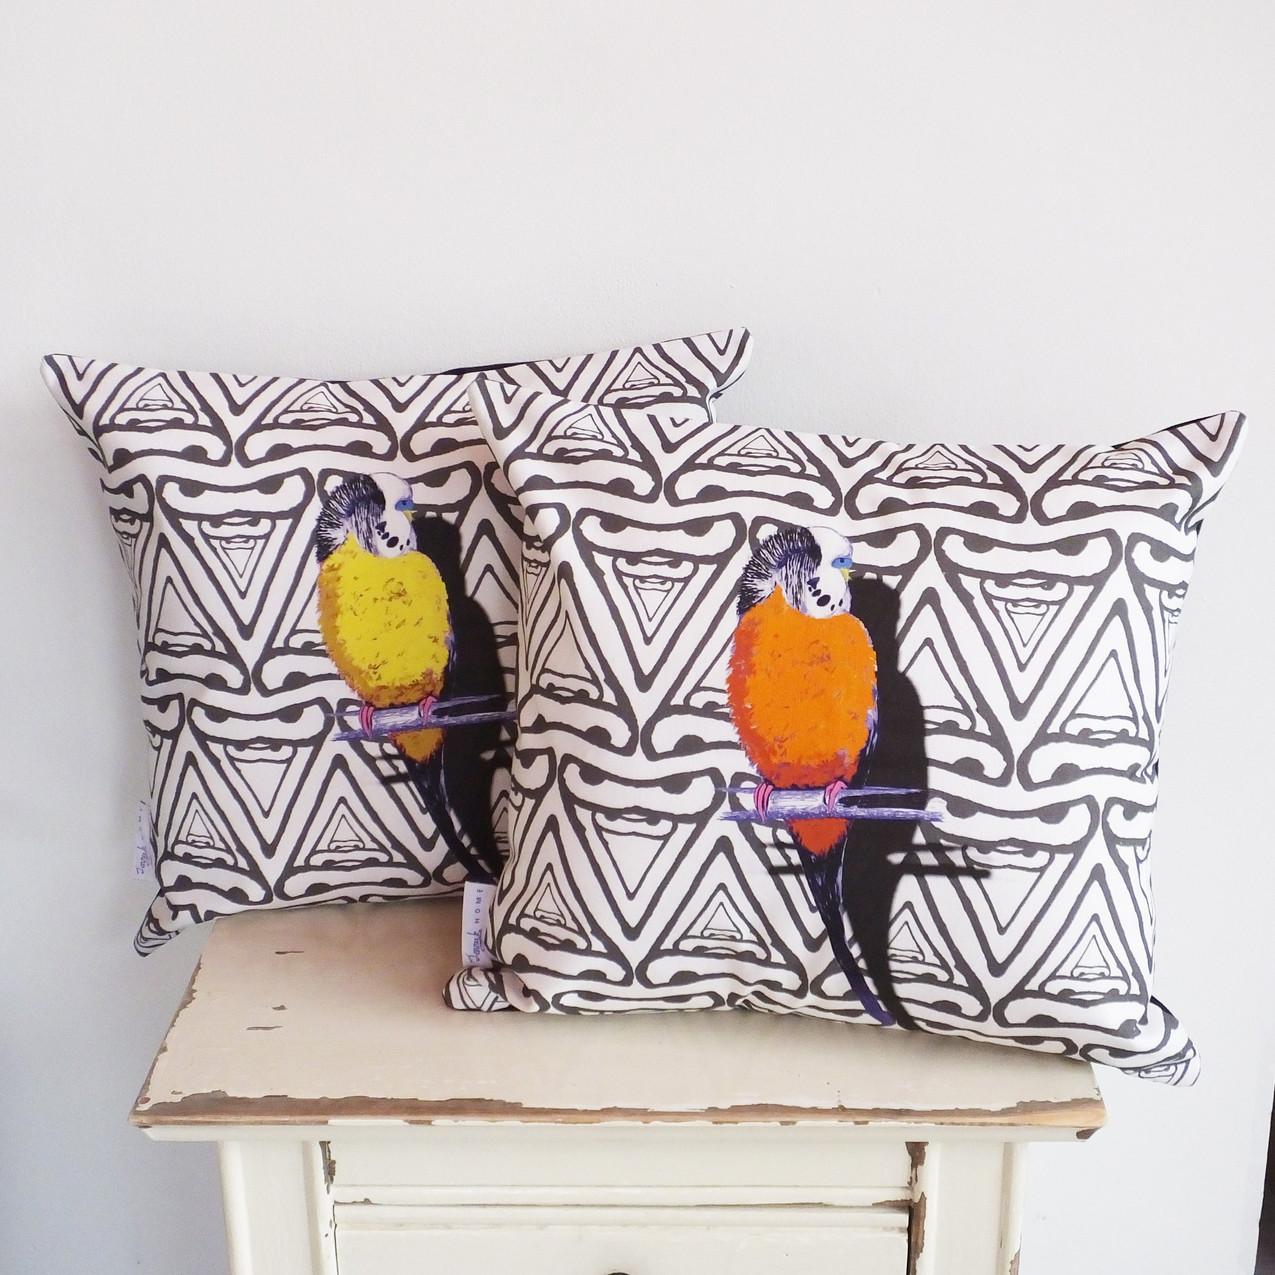 Jenny K Home Orange Monochrome Budgie Cushion 4-min-min